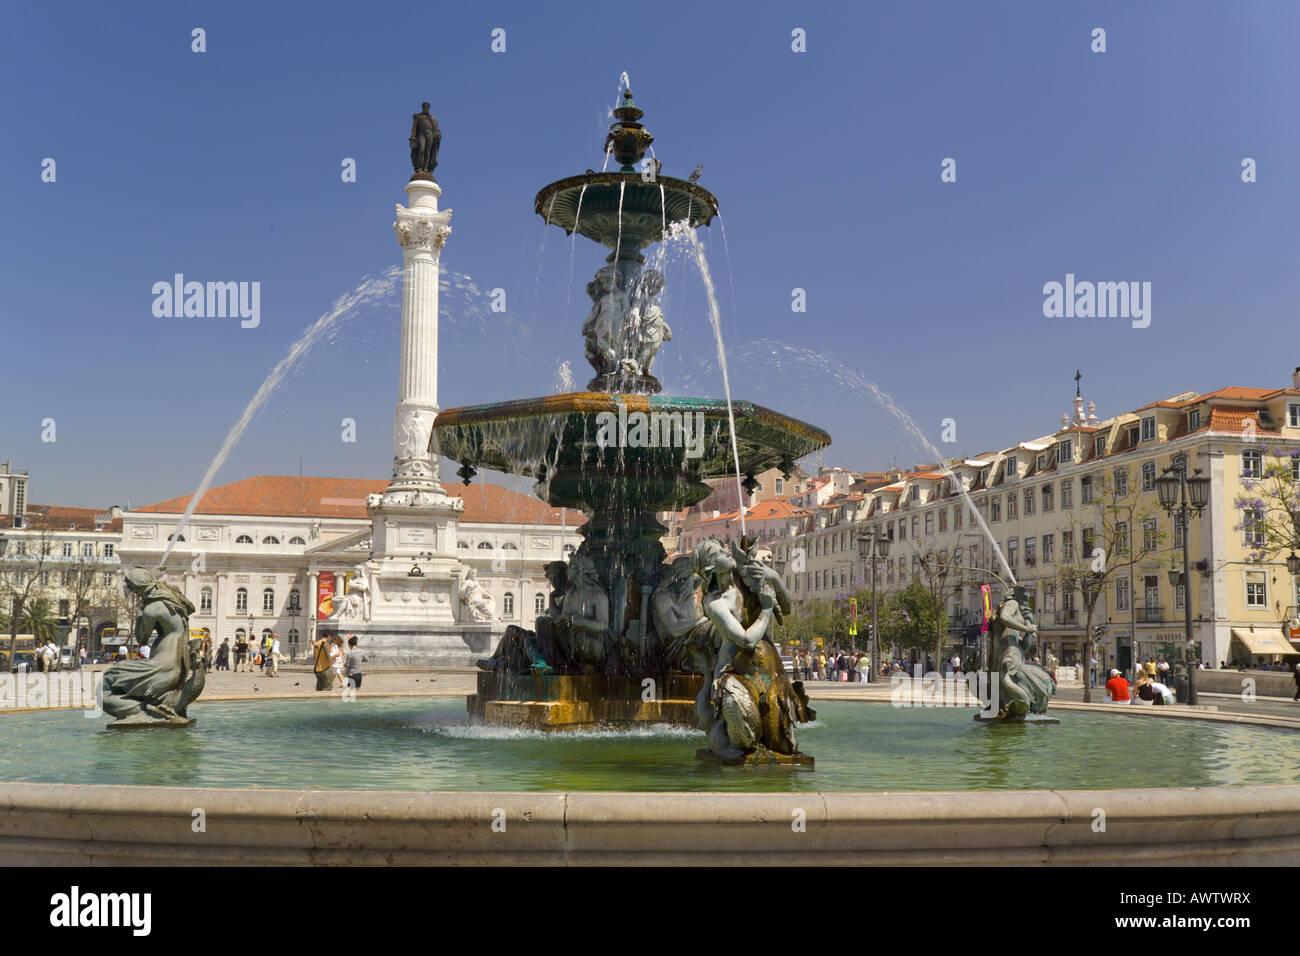 Portugal Lisbon the Baixa district Rossio Square fountain and the statue of Dom Pedro IV - Stock Image